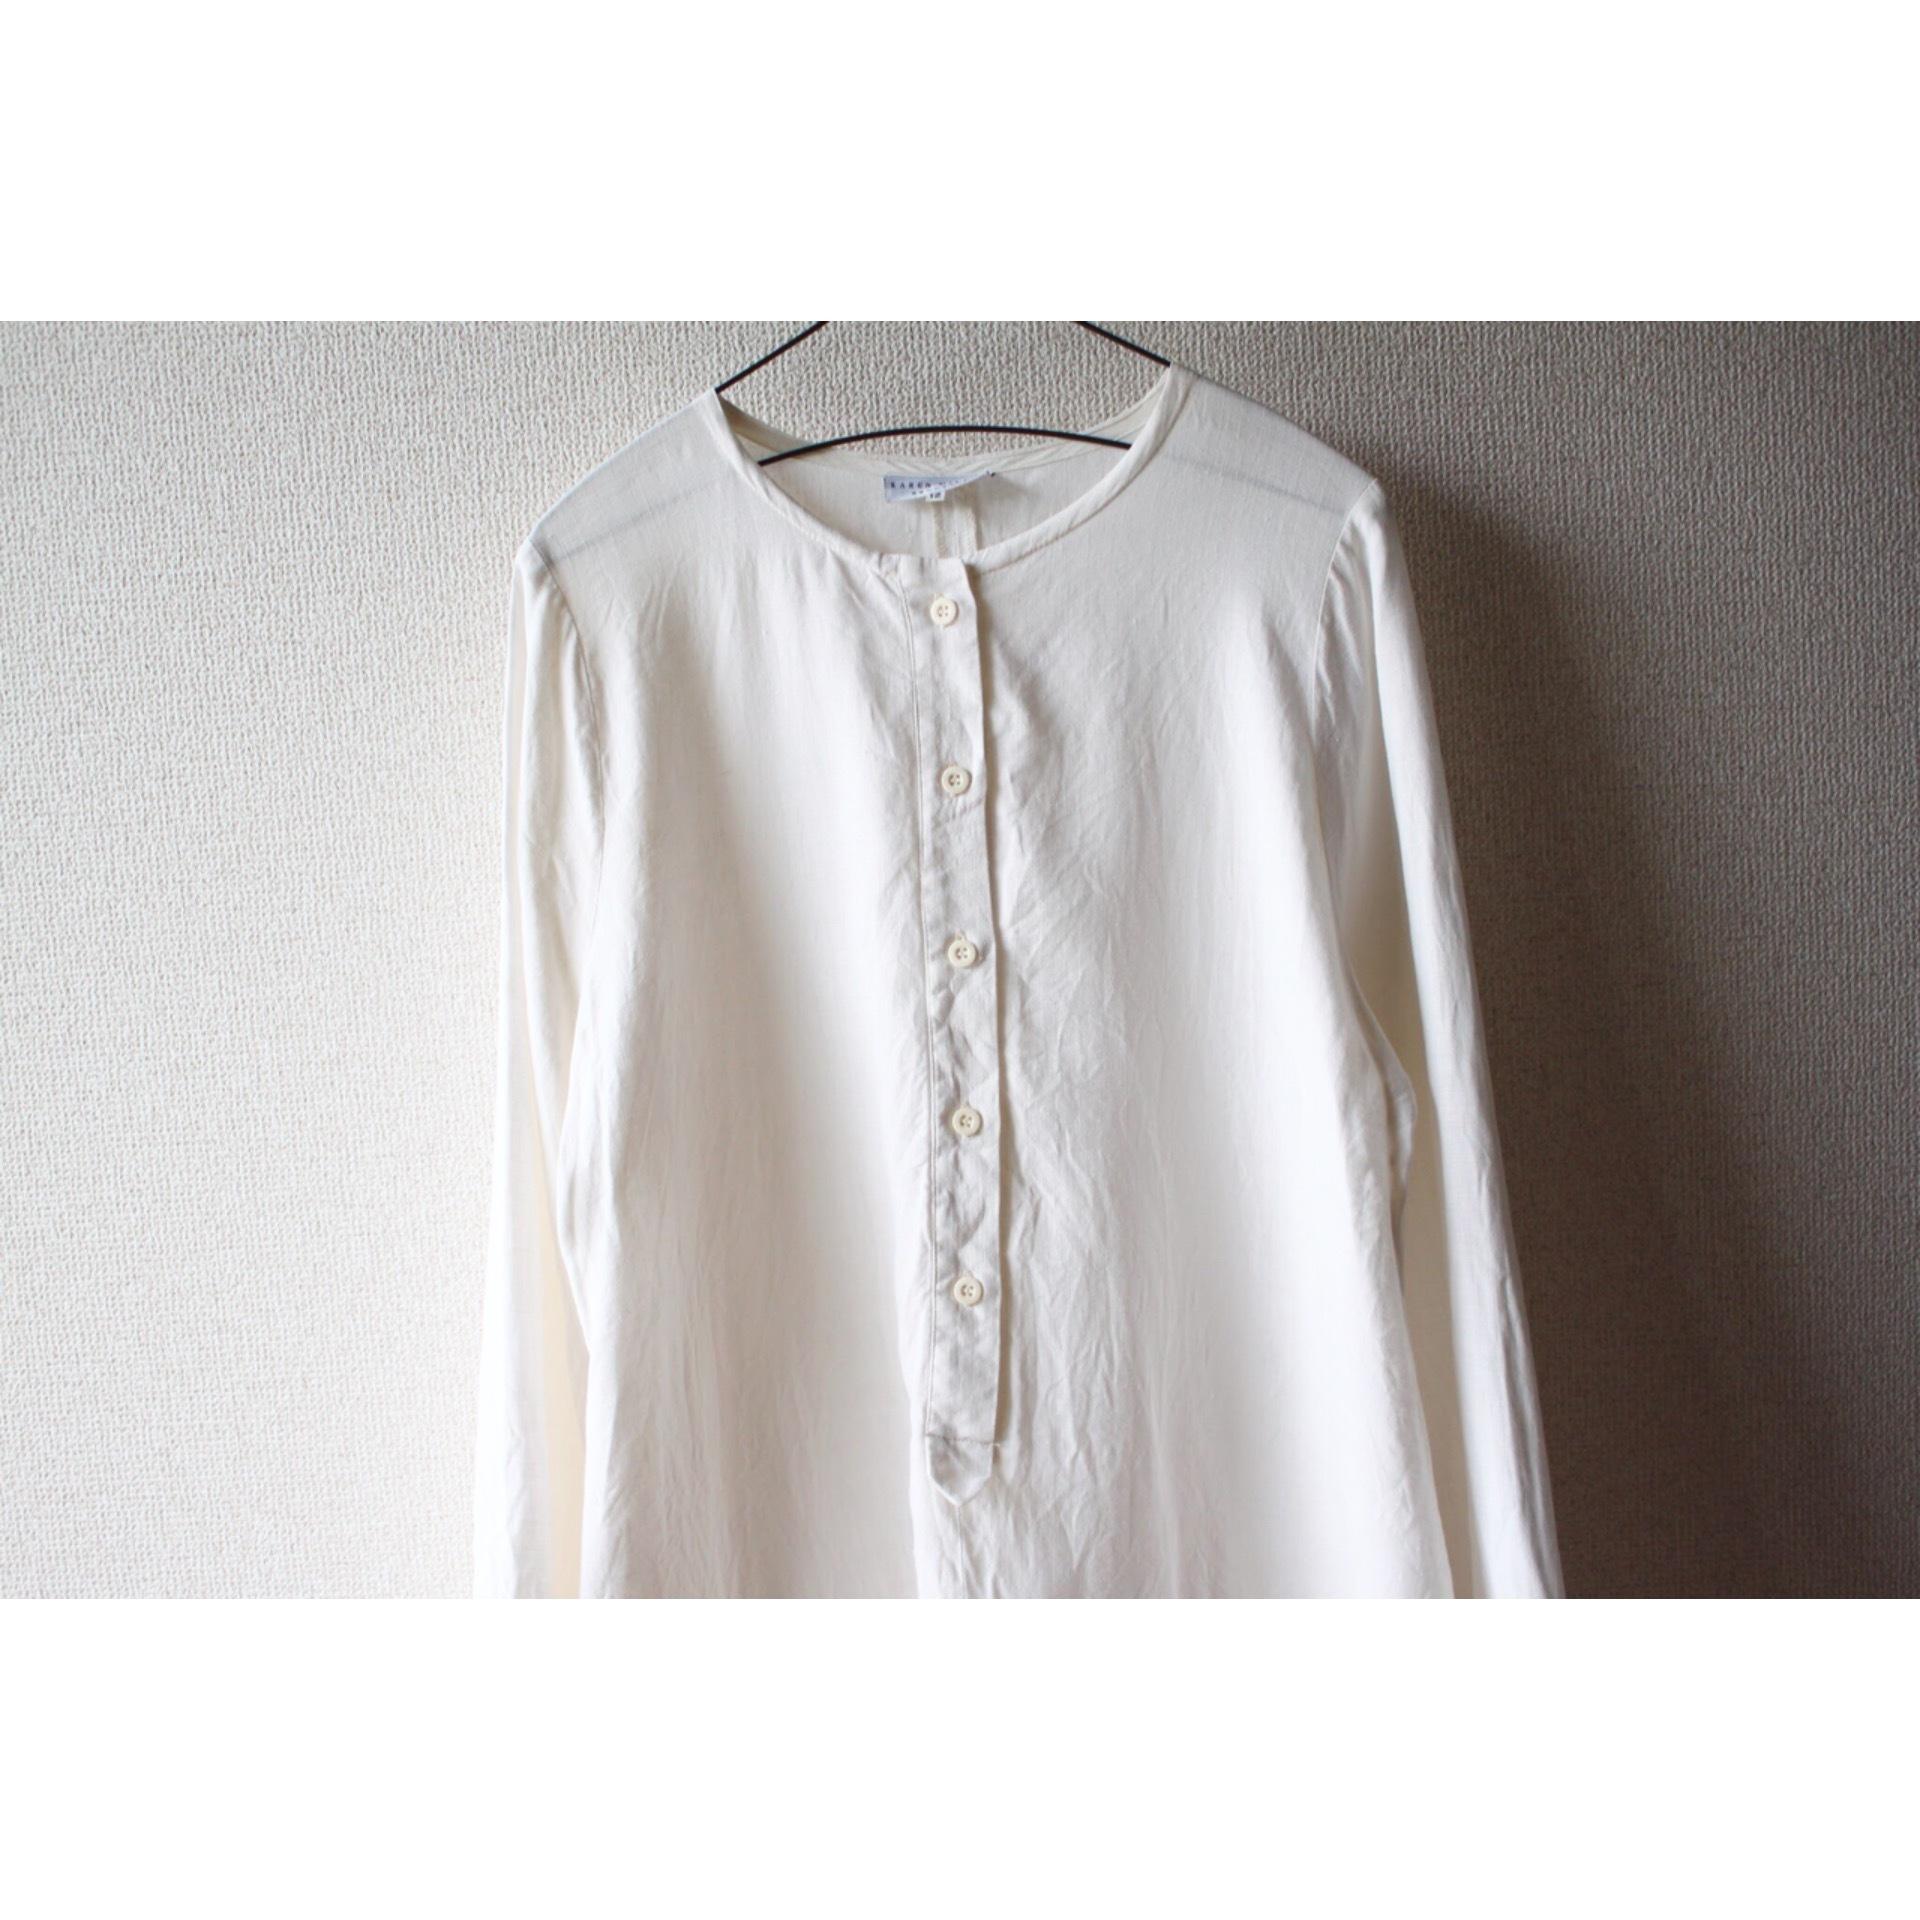 Vintage linen dress